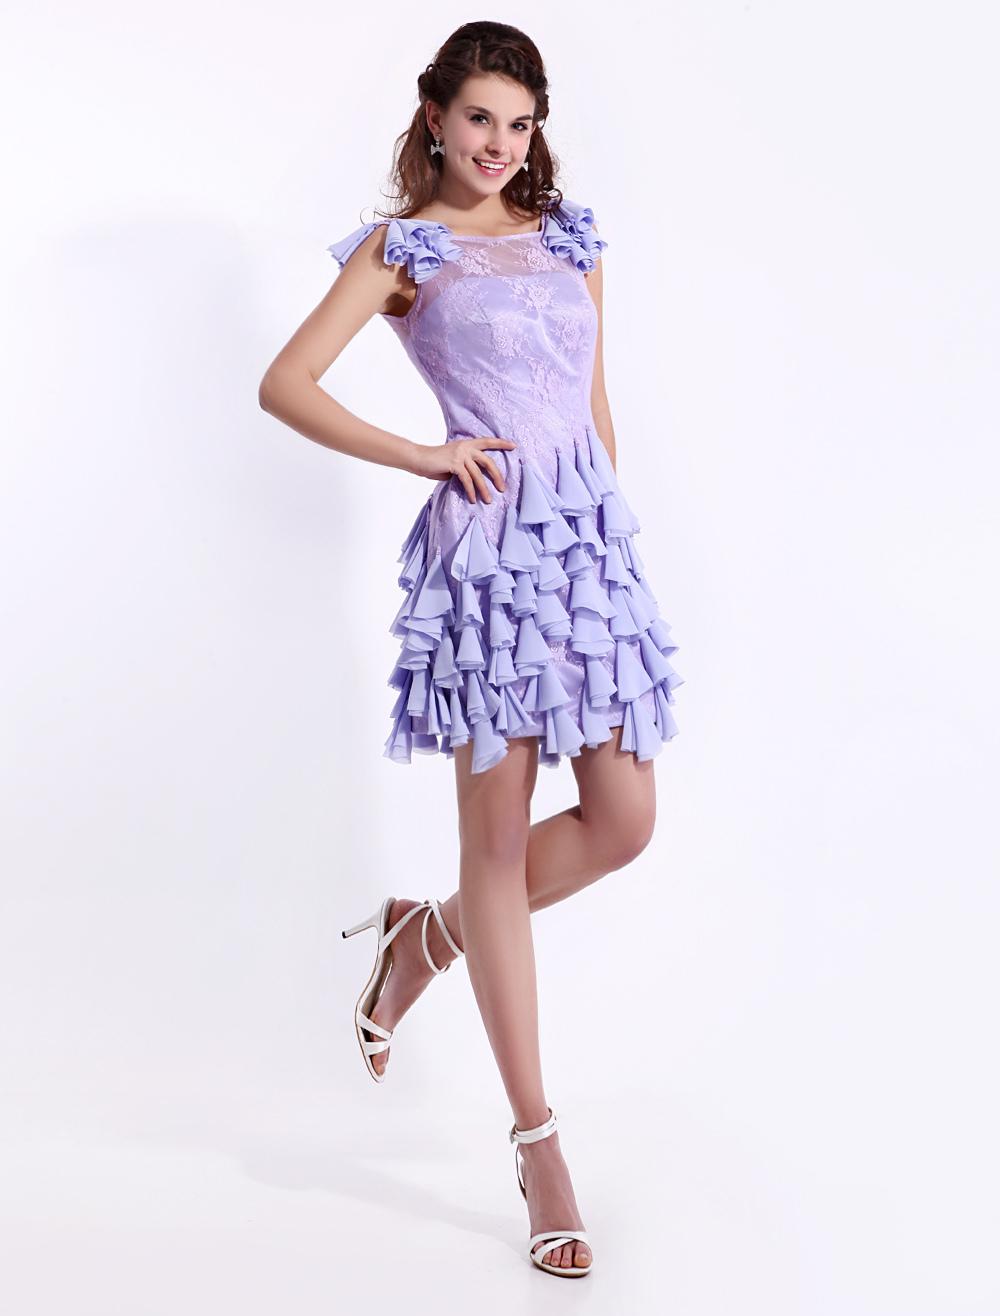 Lavender Sheath Lace Scoop Neck Fashion Cocktail Dress Milanoo ...